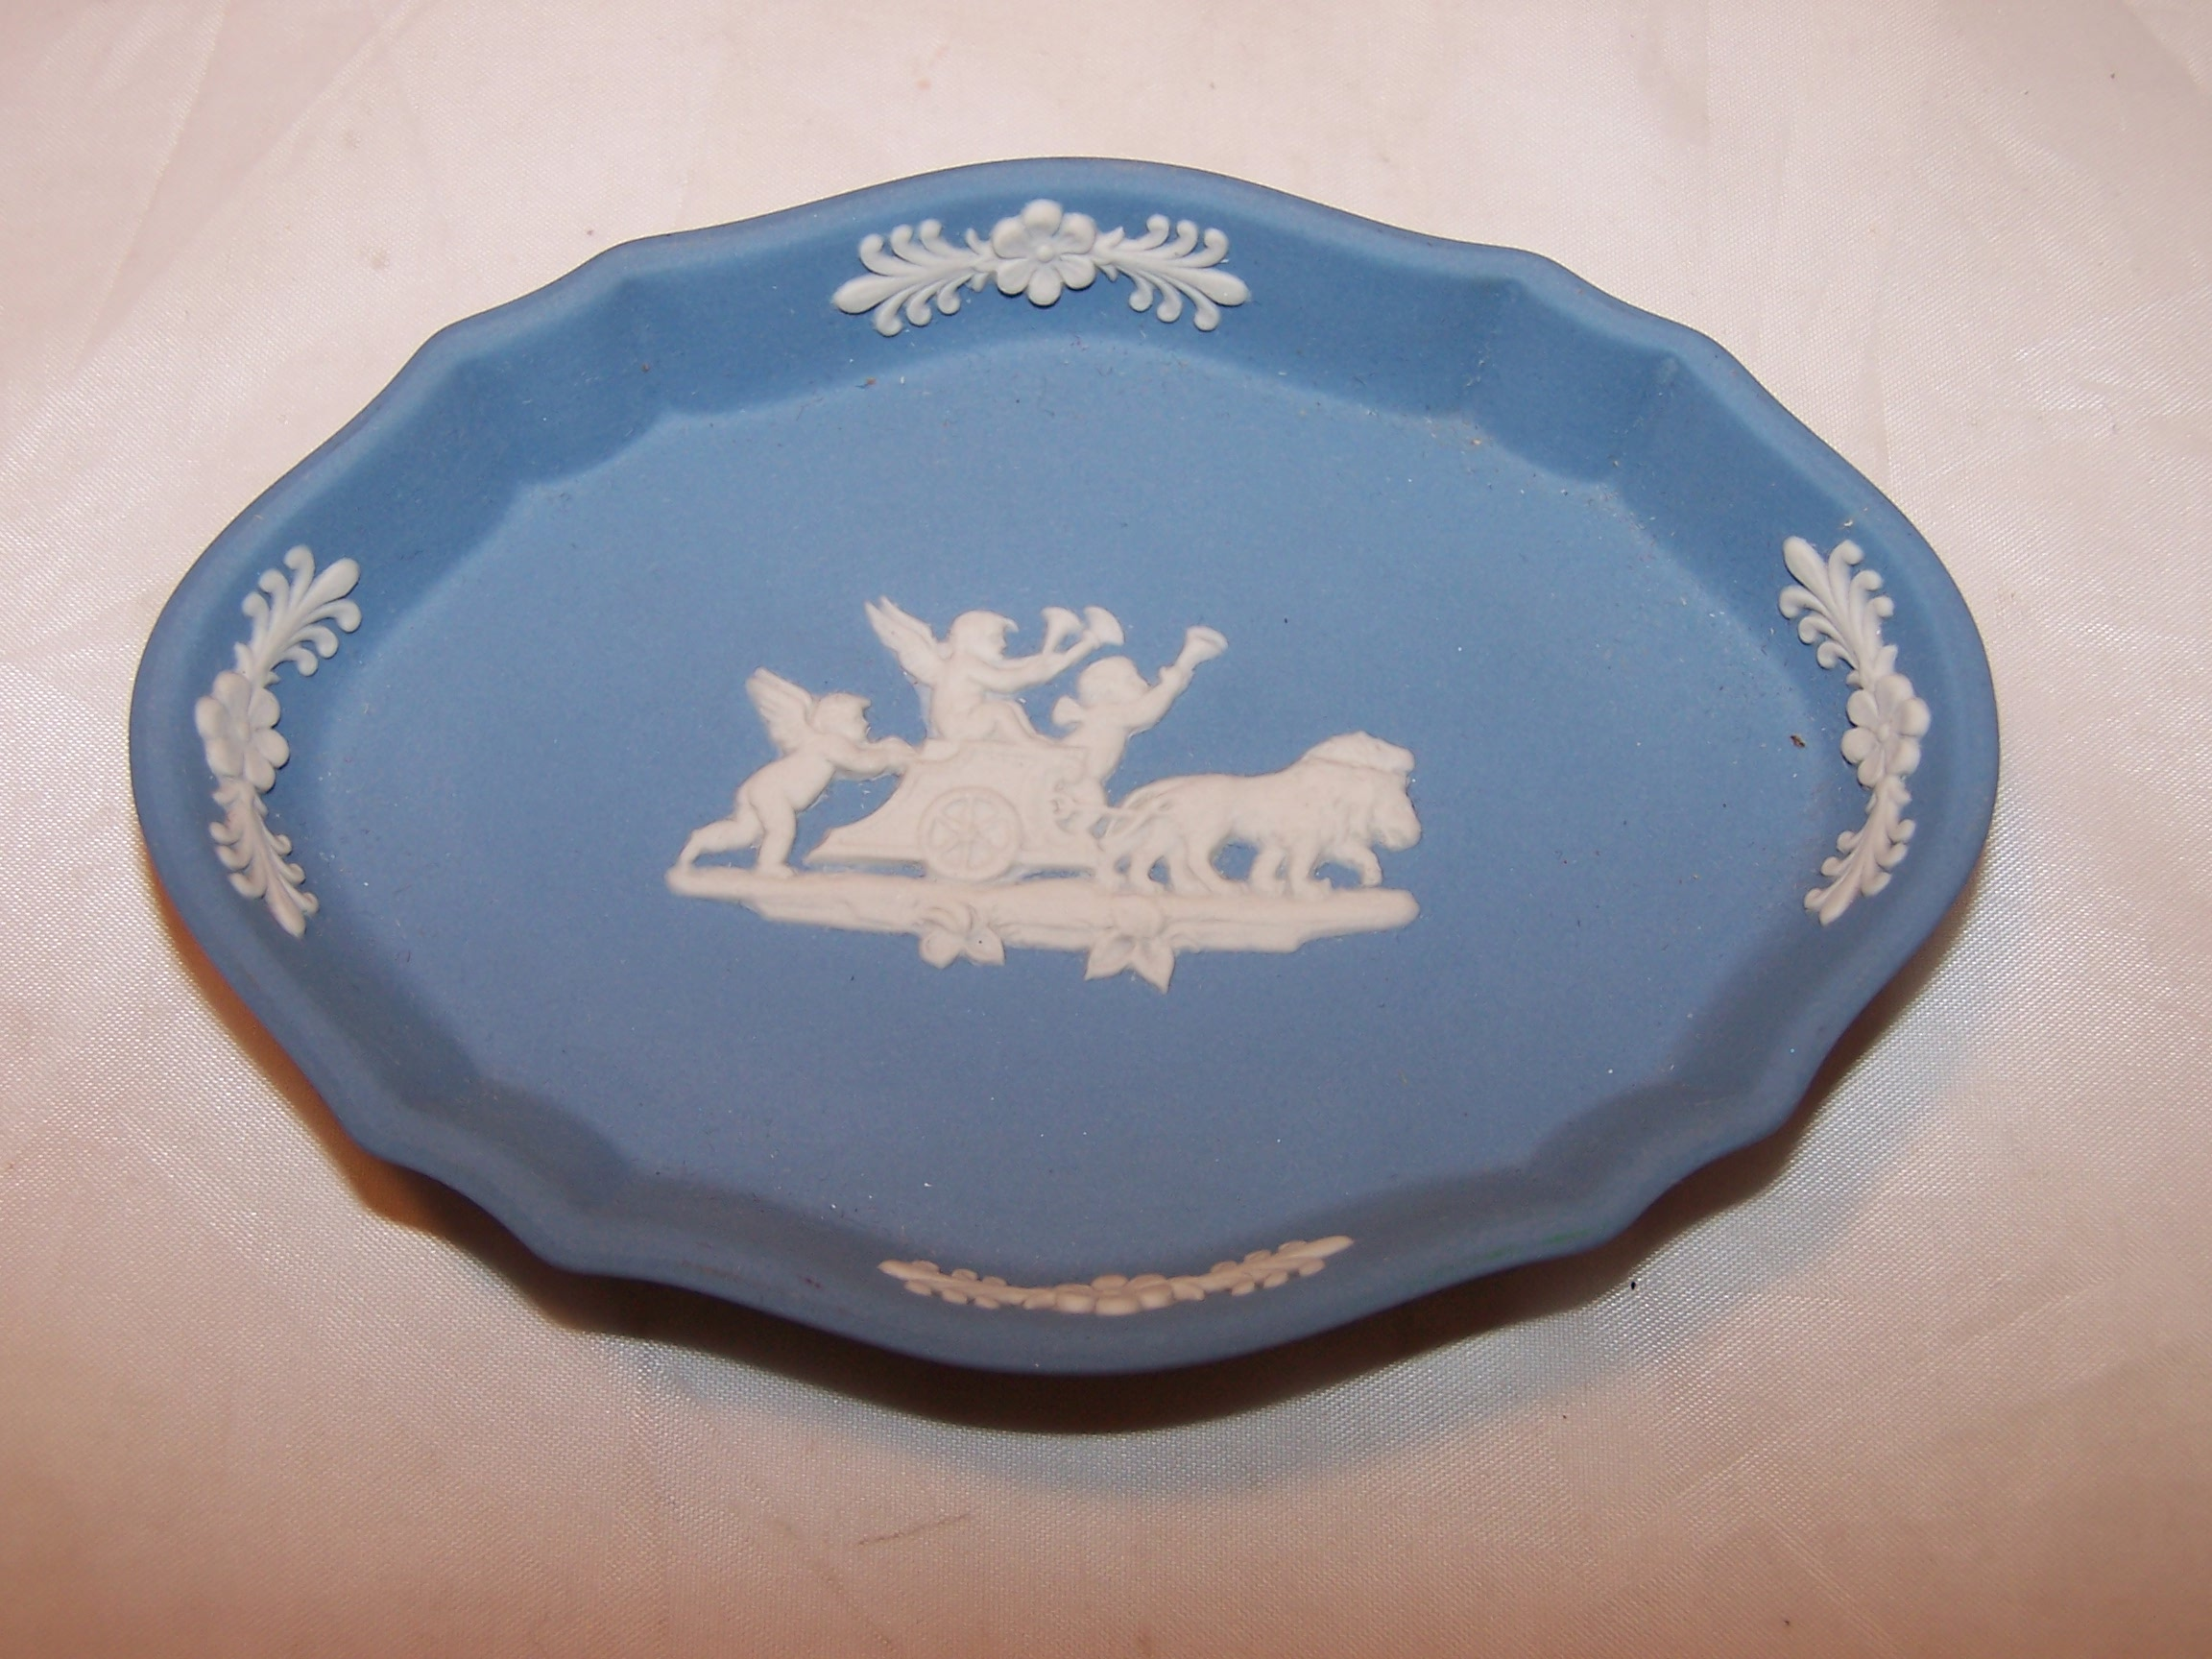 Wedgwood Jasperware Oval Dish